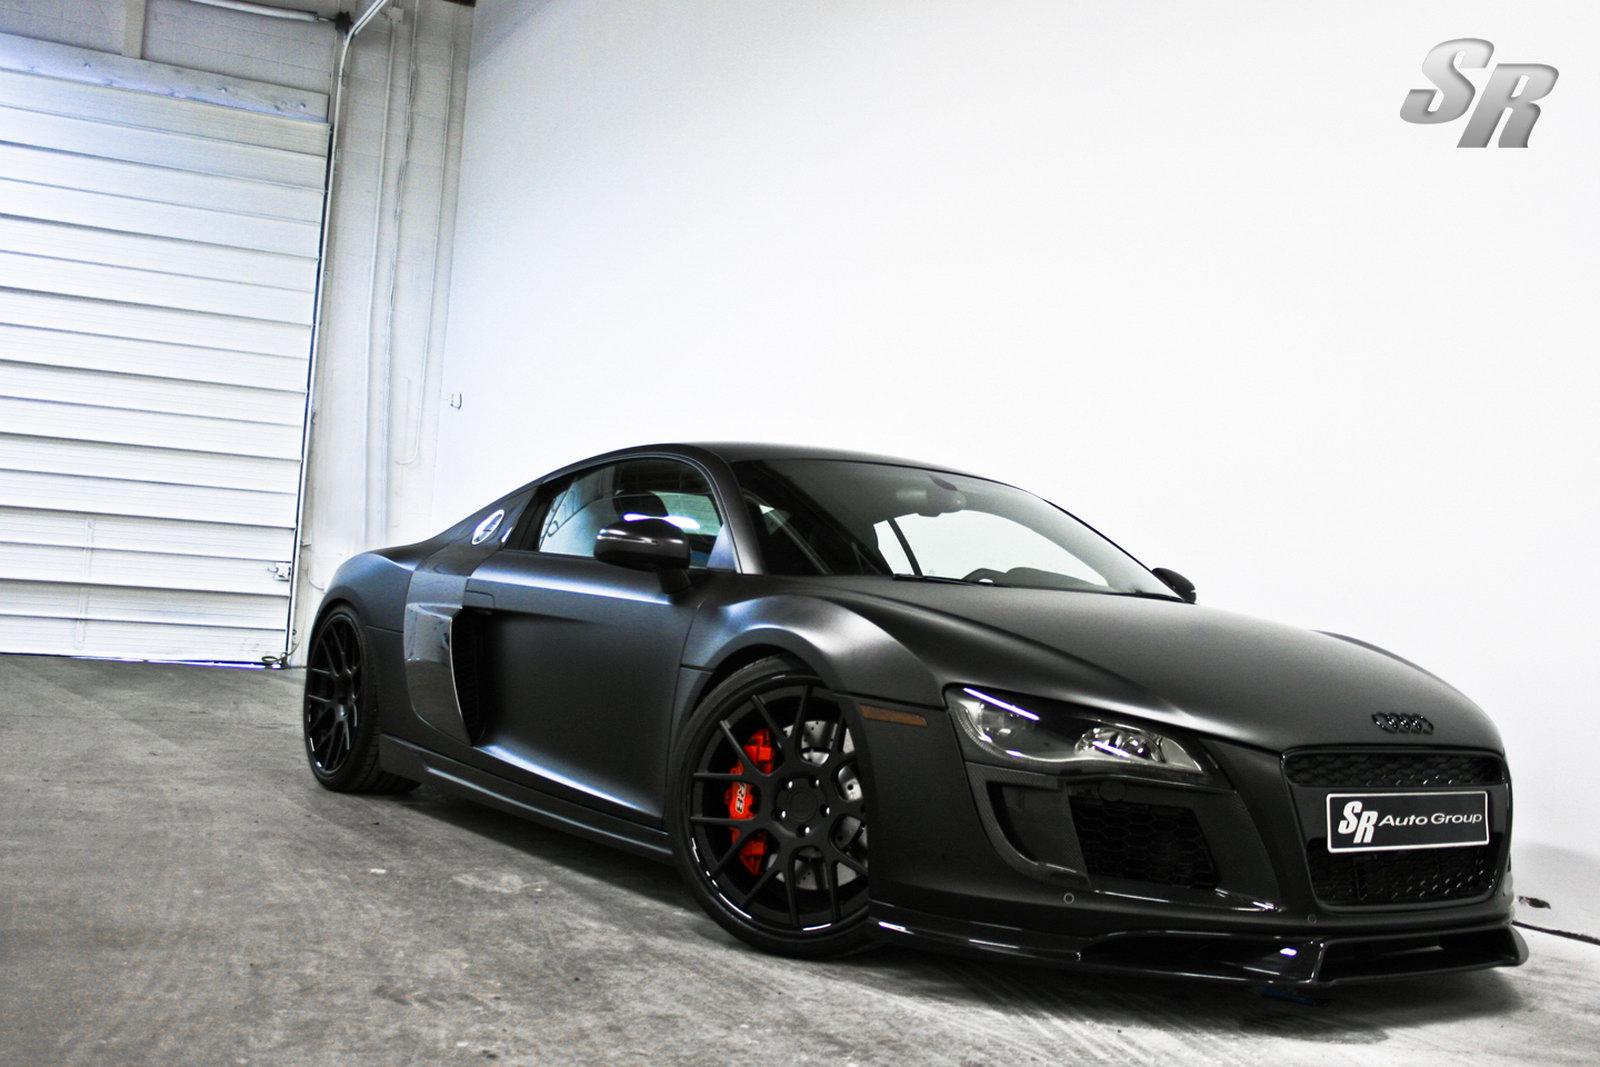 Audi of the Week – SR Autogroup's R8   CleanAudi